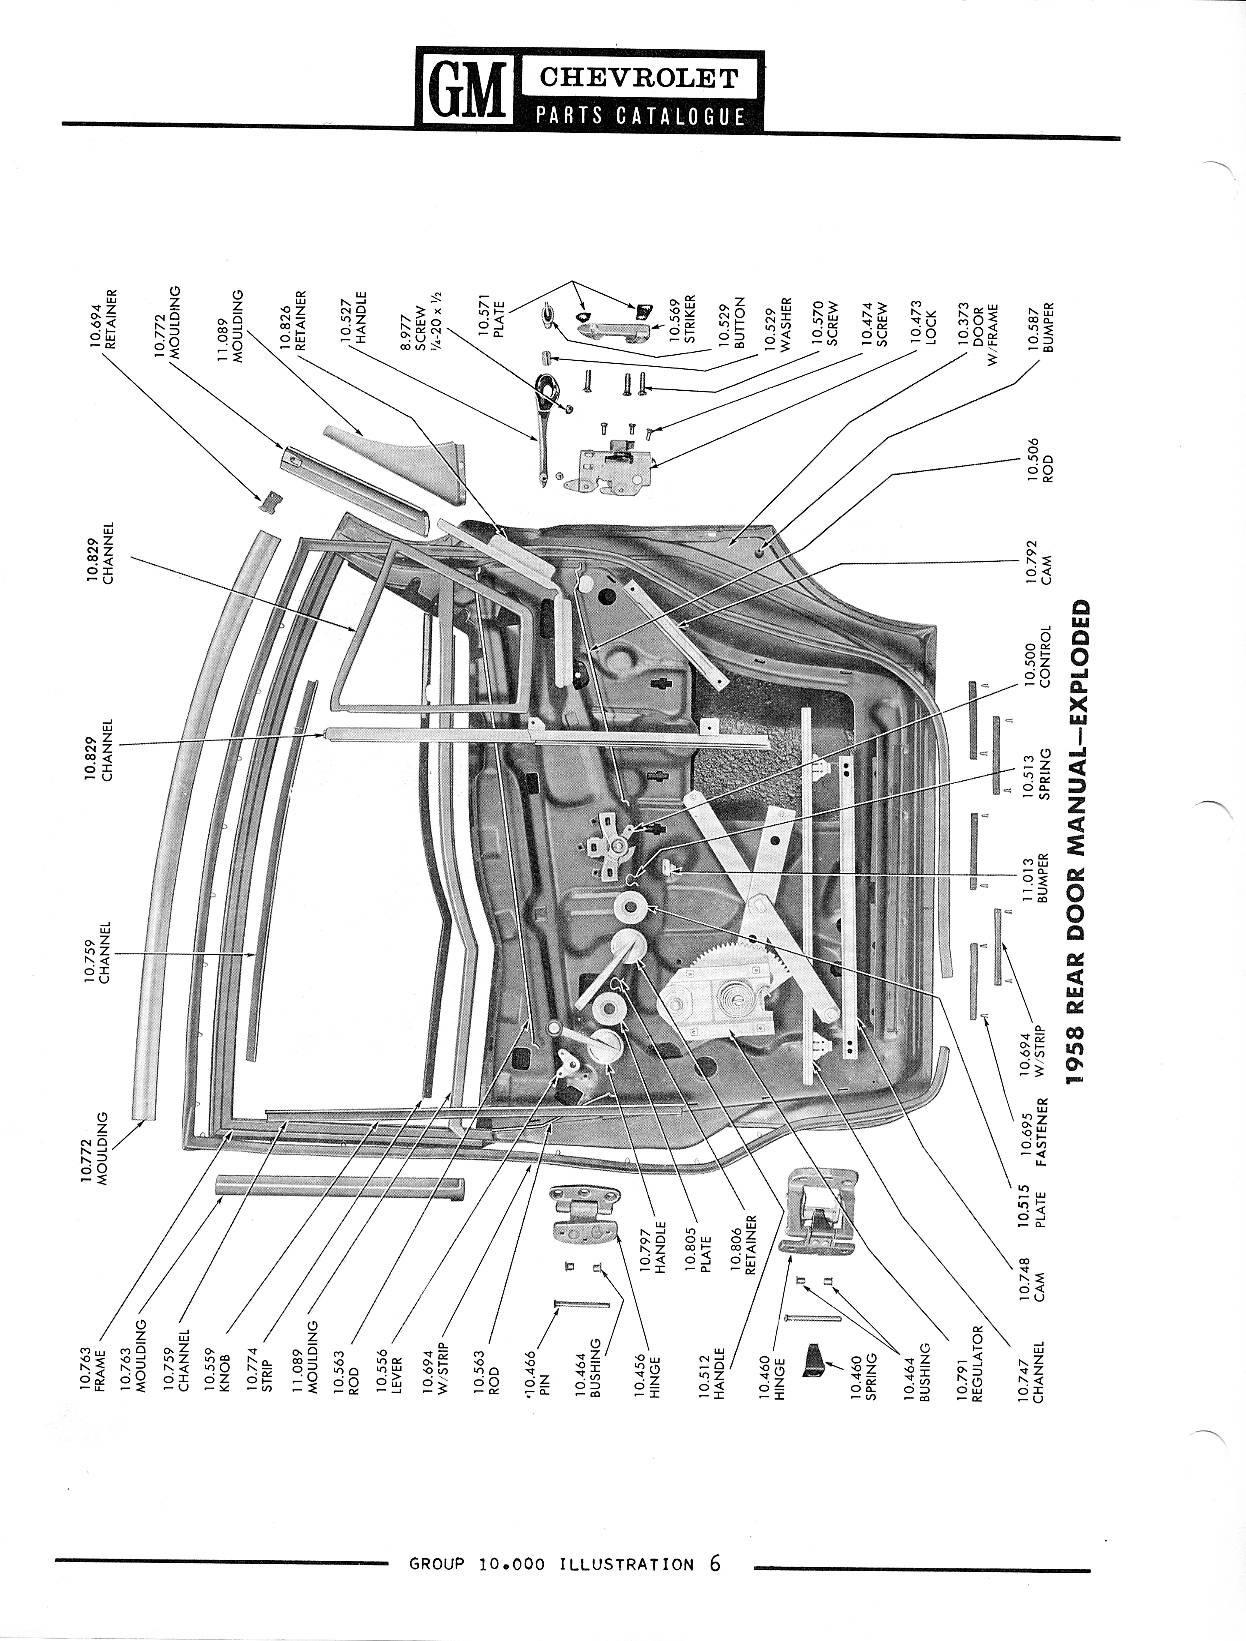 1958-1968 Chevrolet Parts Catalog / Image114.jpg